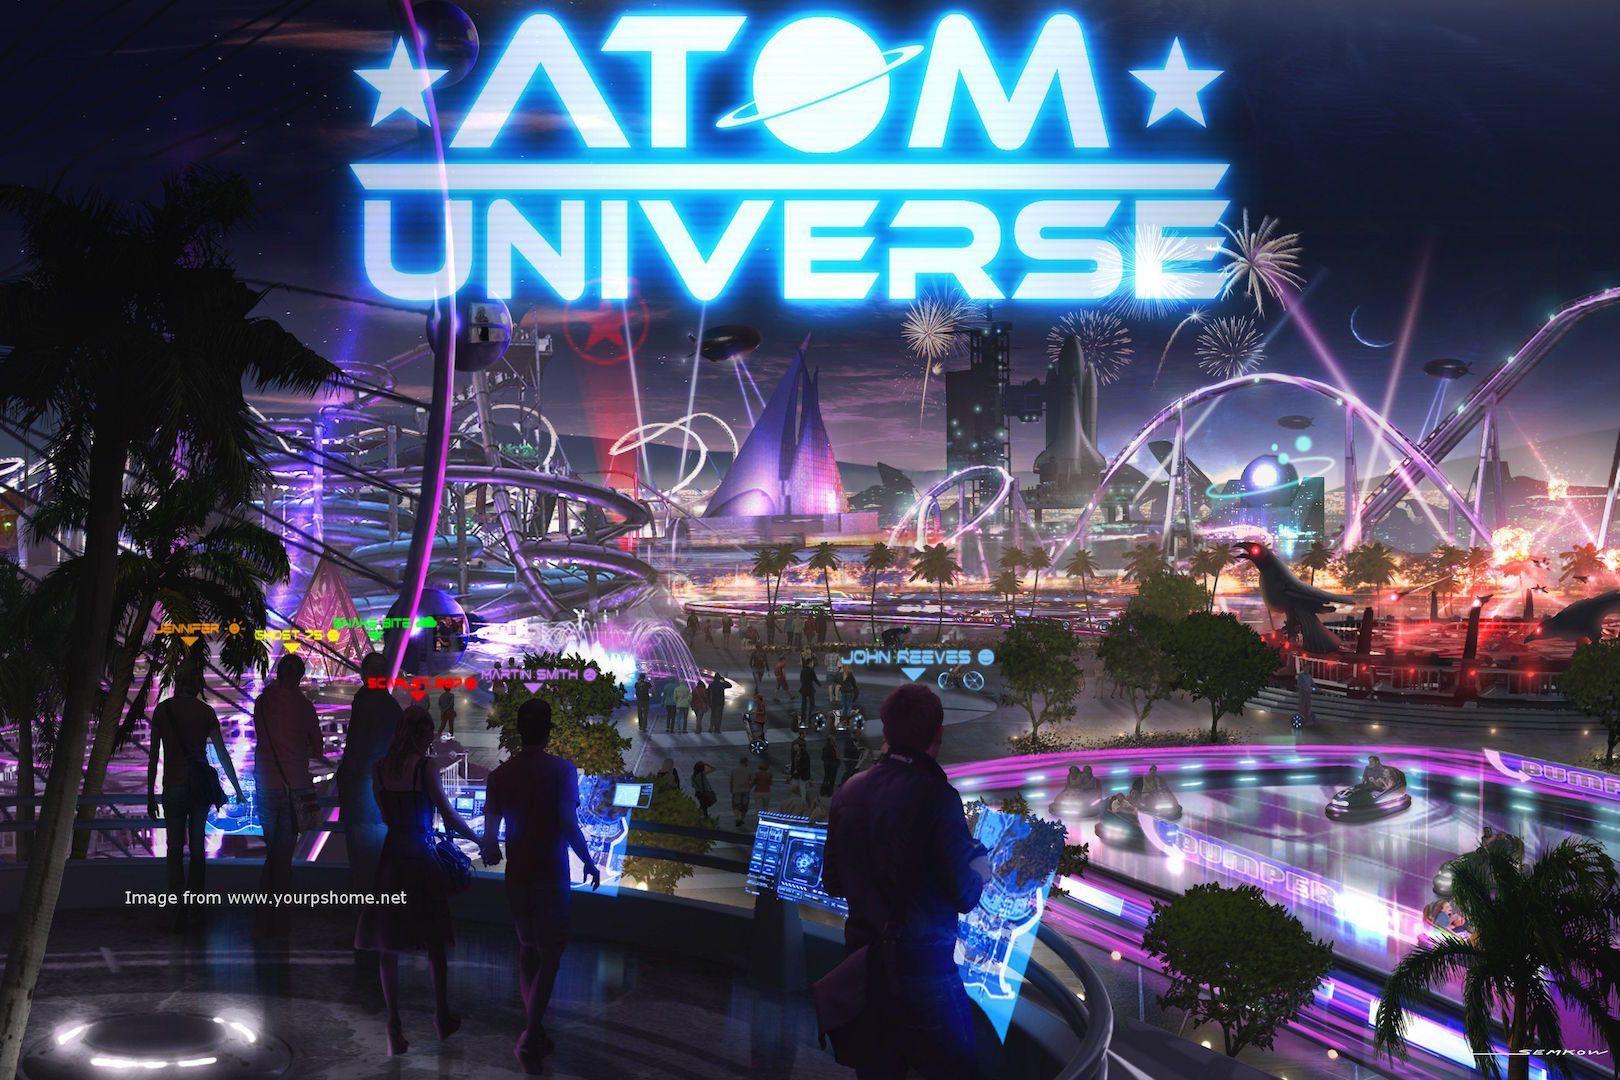 Karen Talks To Atom Republic About Atom Universe, kwoman32, Nov 30, 2014, 4:55 PM, YourPSHome.net, jpg, ConceptIllustration-copy.jpg